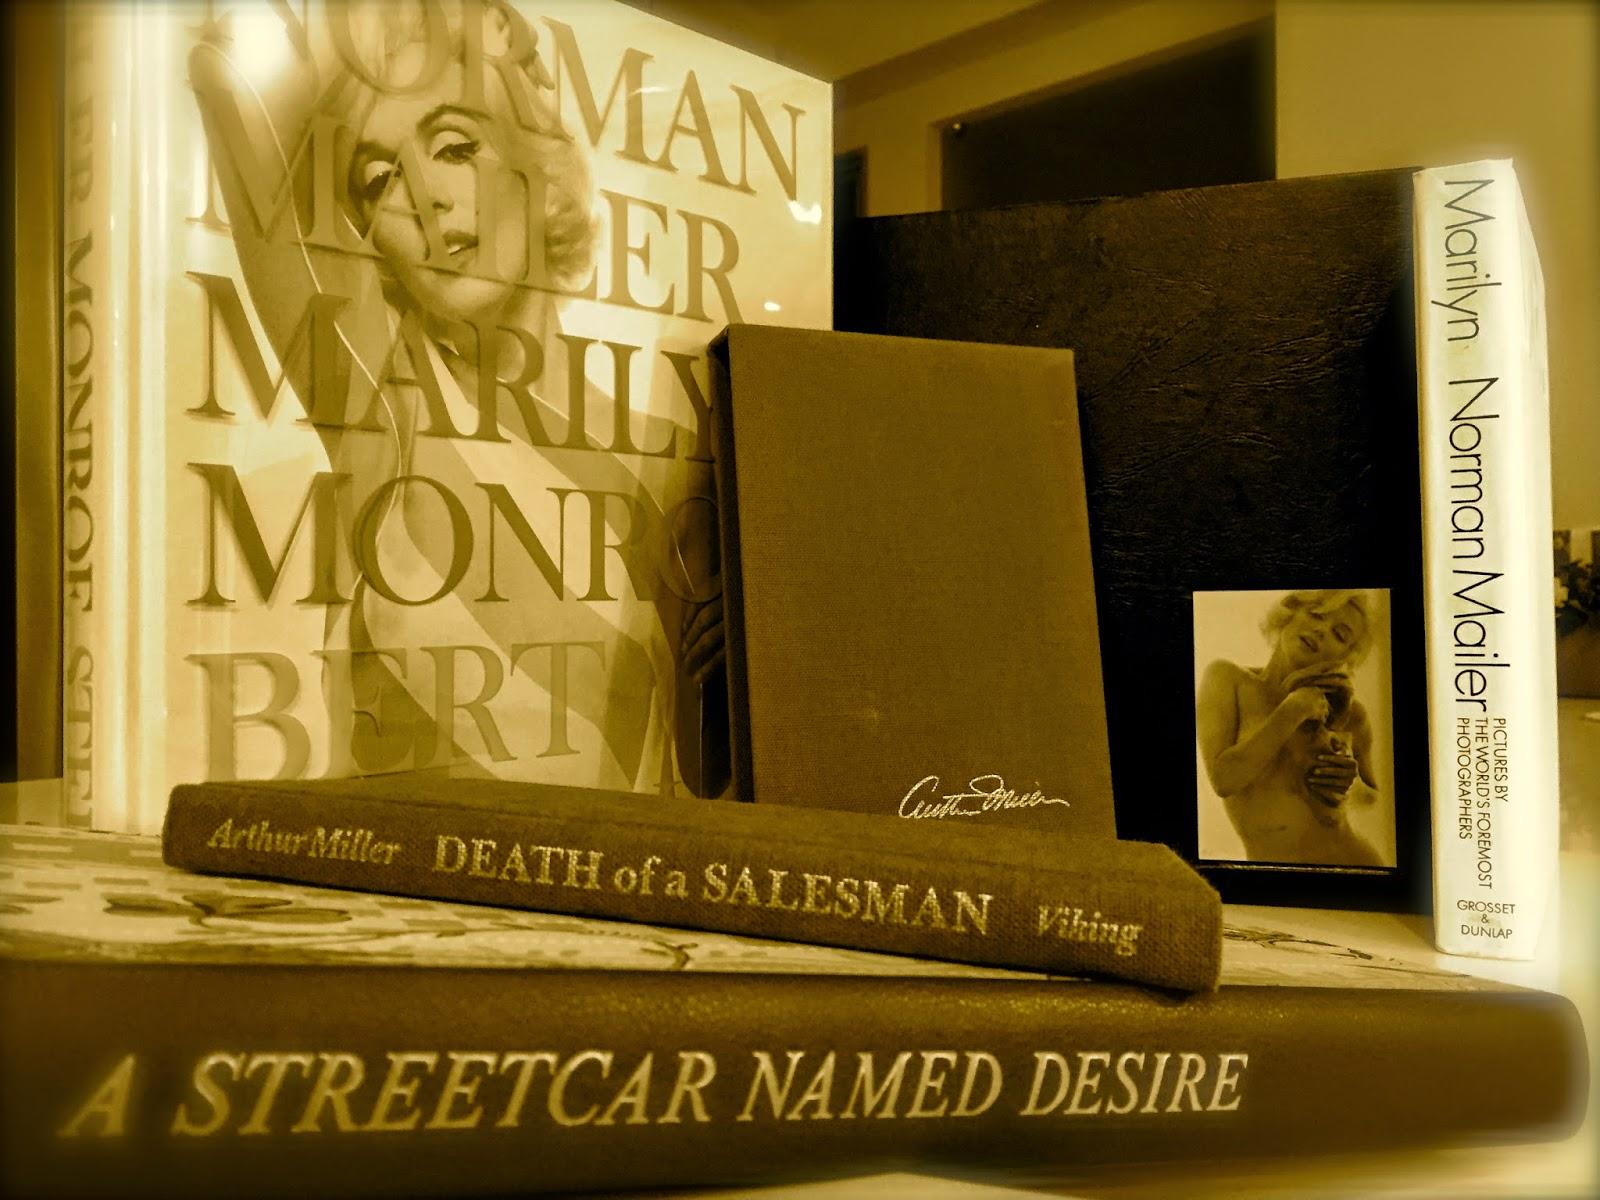 streetcar named desire full text